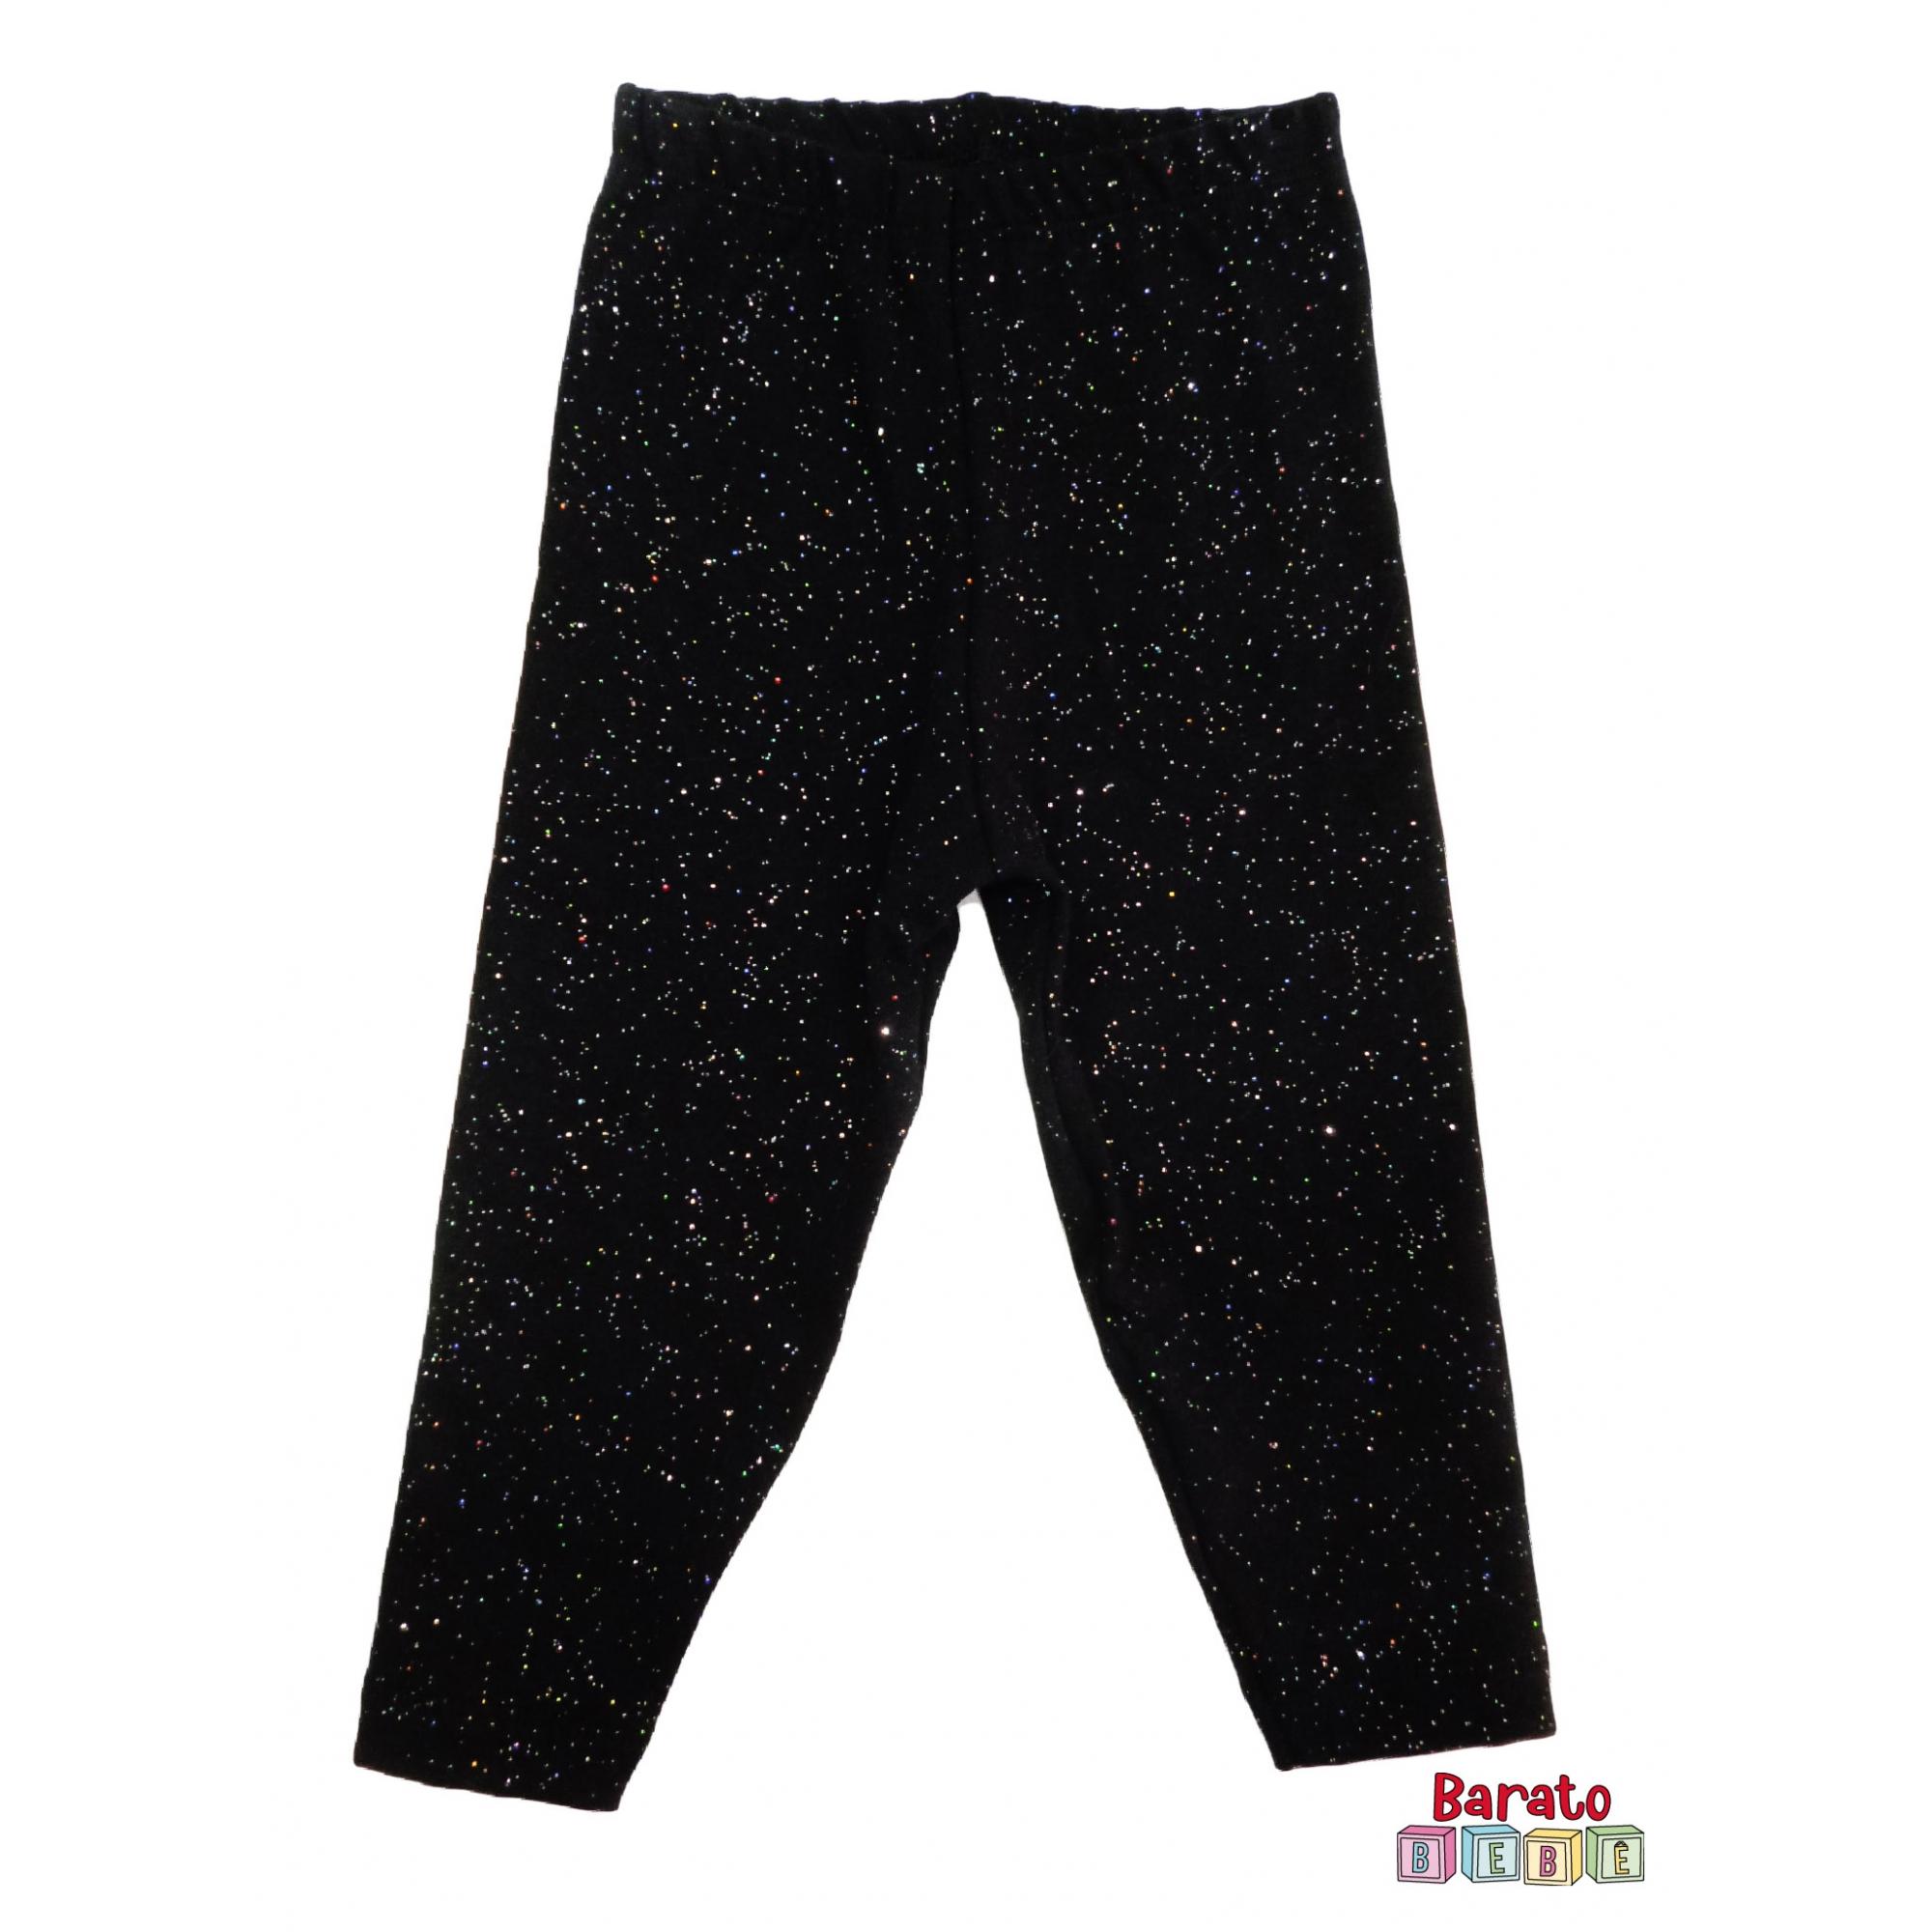 Kit 2 Body + 1 Legging c/ Glitter (P/M/G) - Barato Bebê